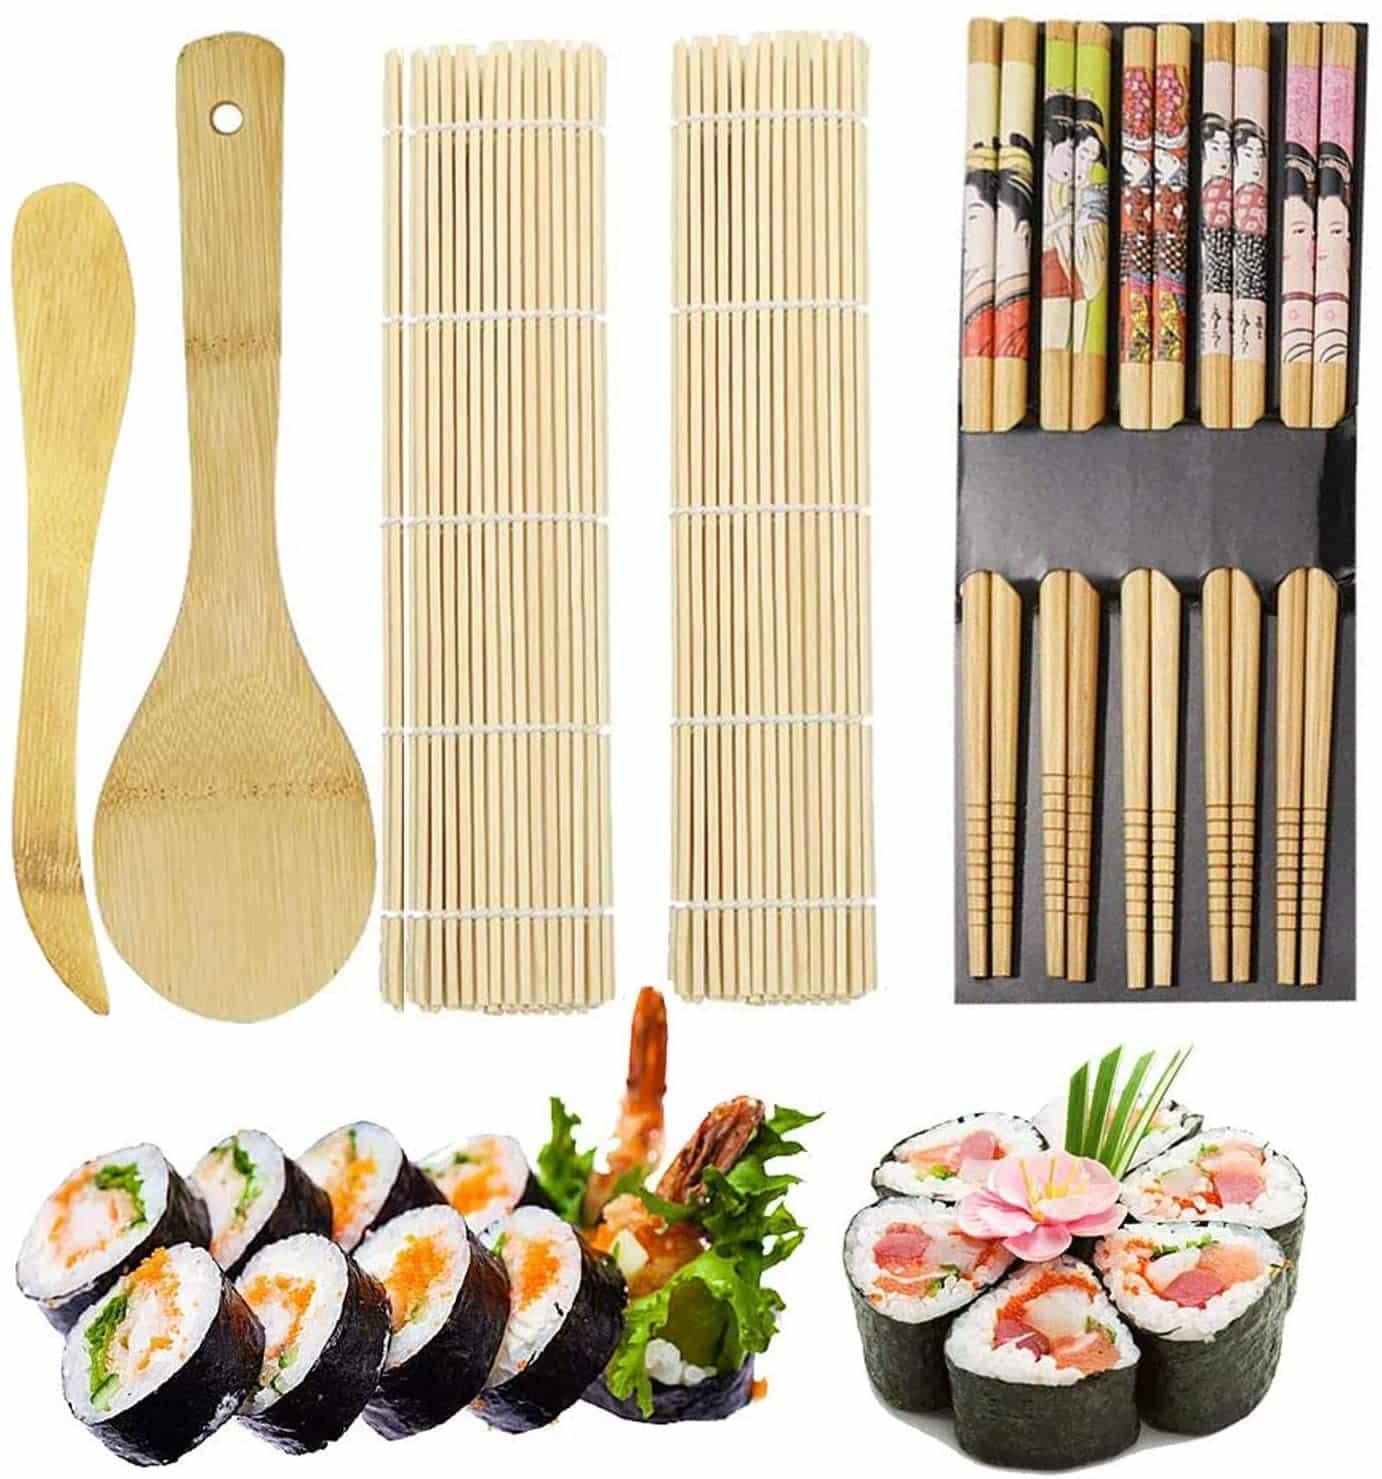 Un kit de fabrication de Sushis en bambou